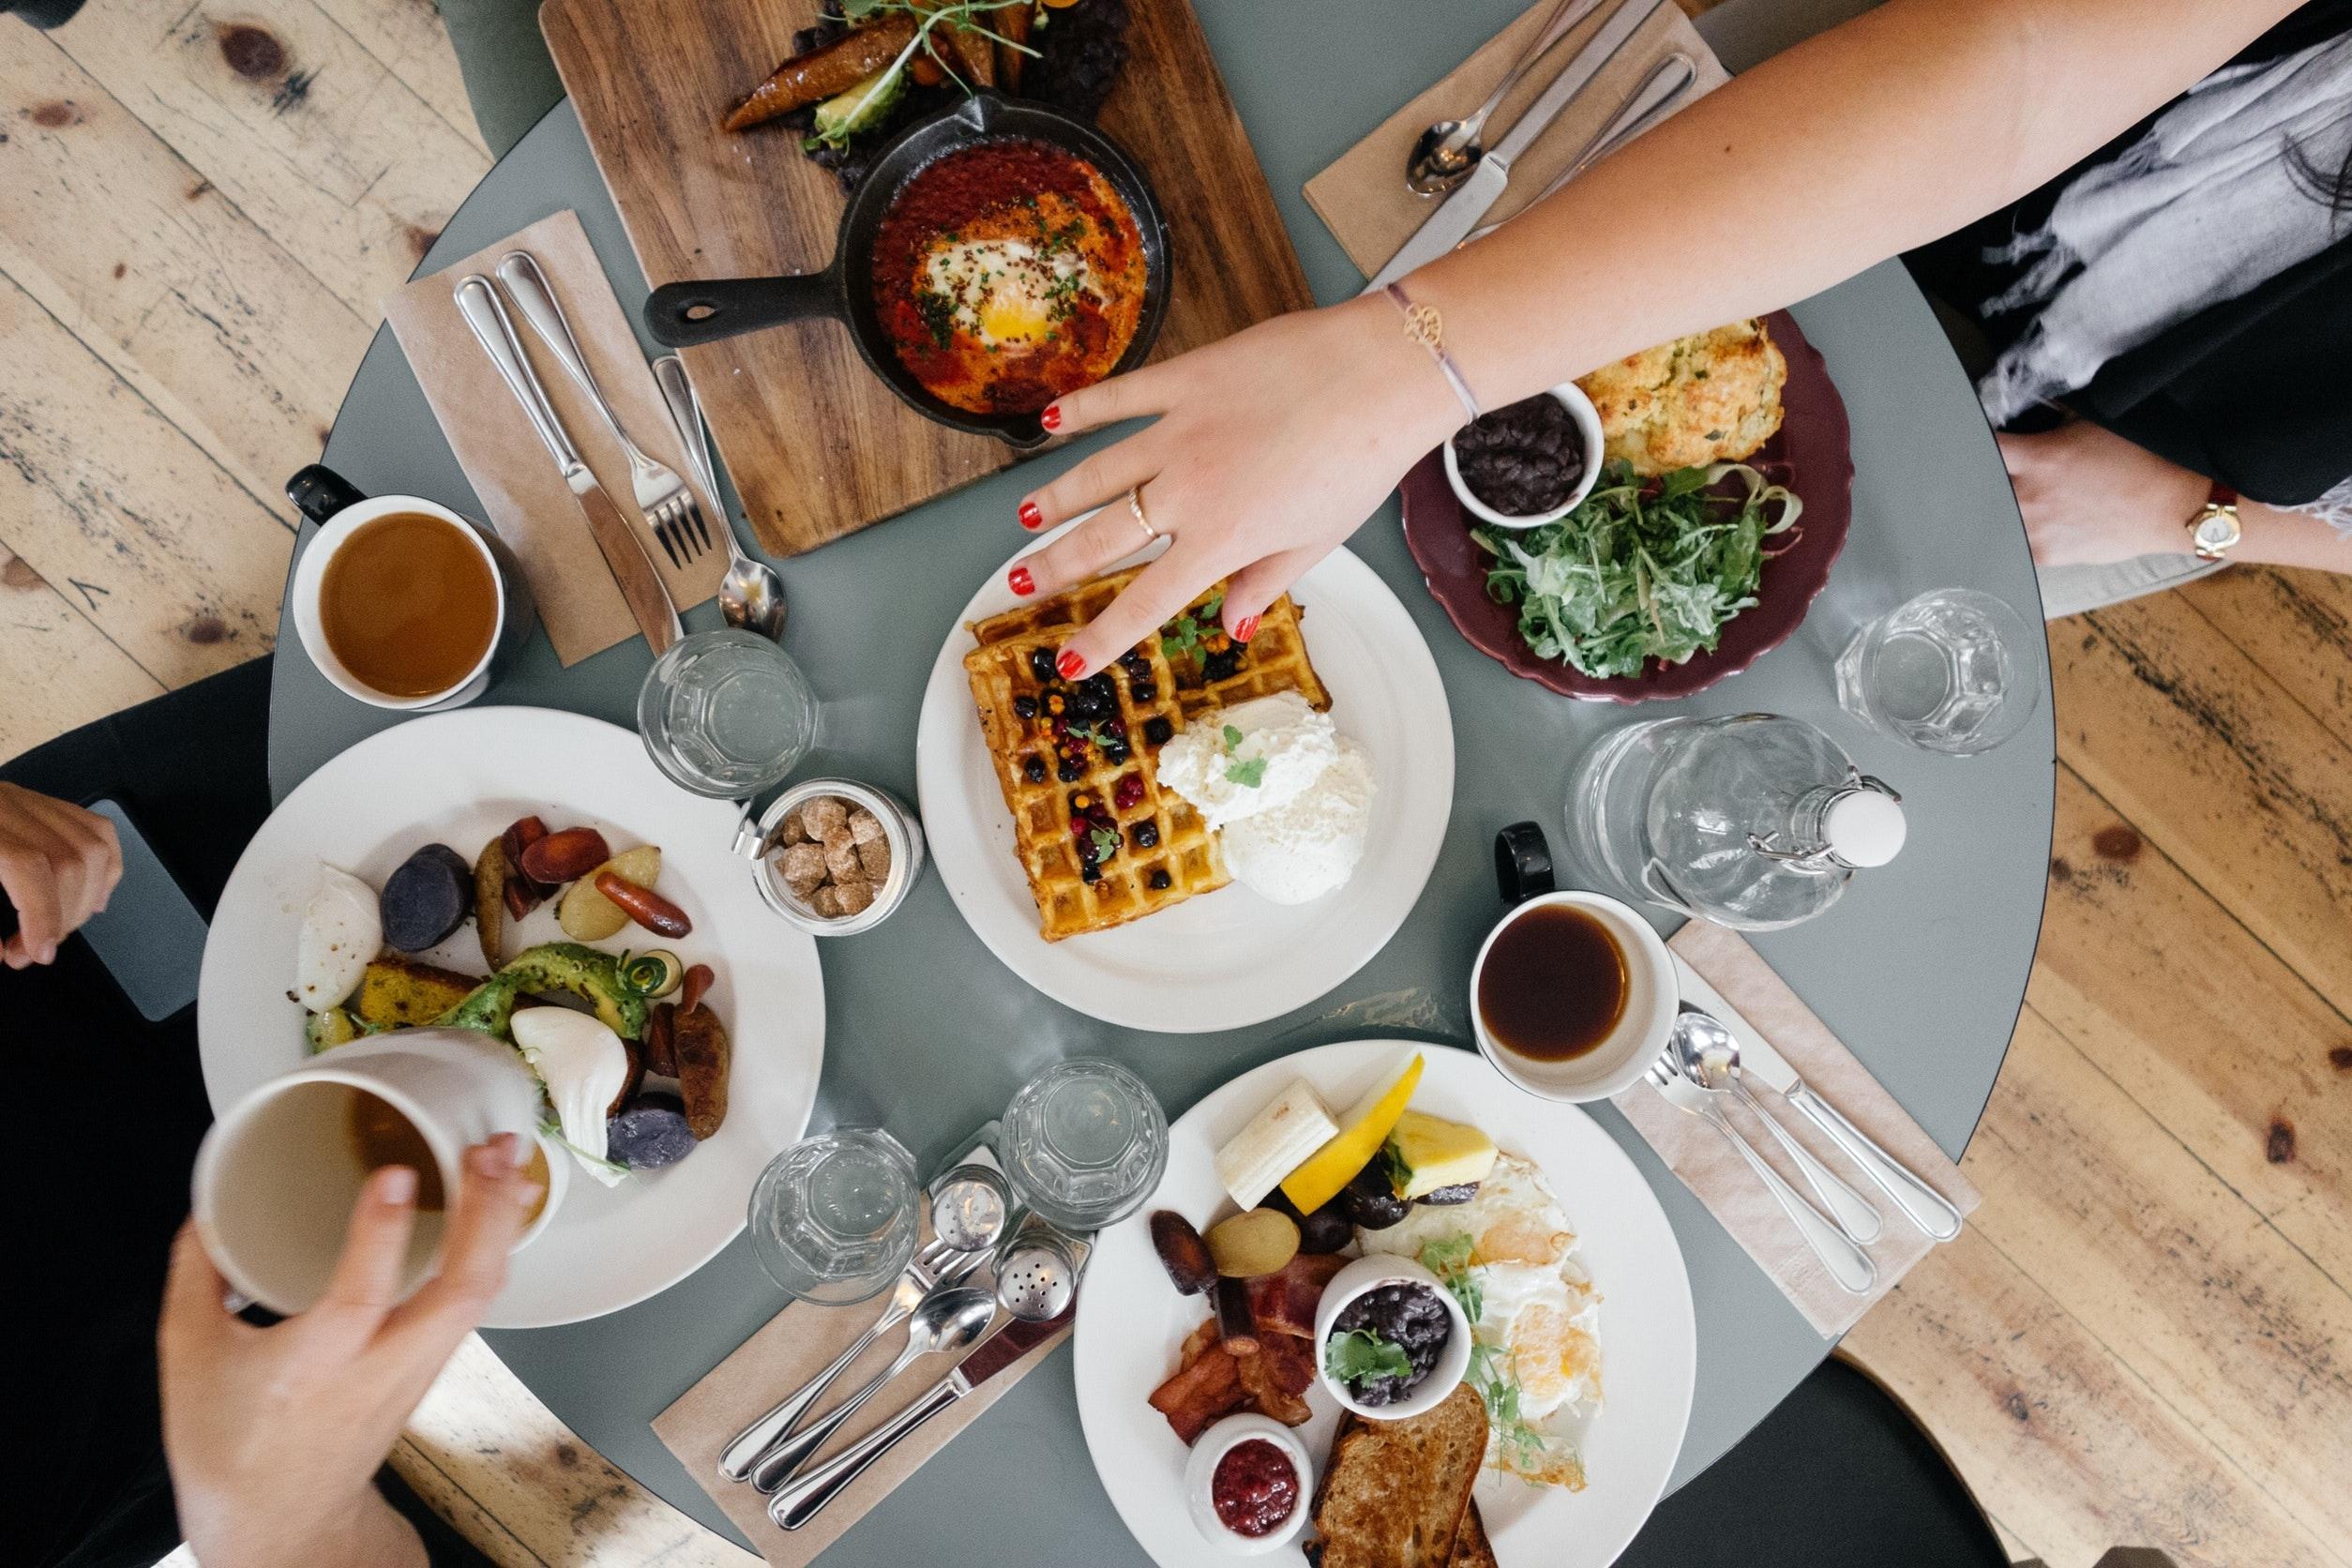 waffle-on-white-ceramic-plate-511763